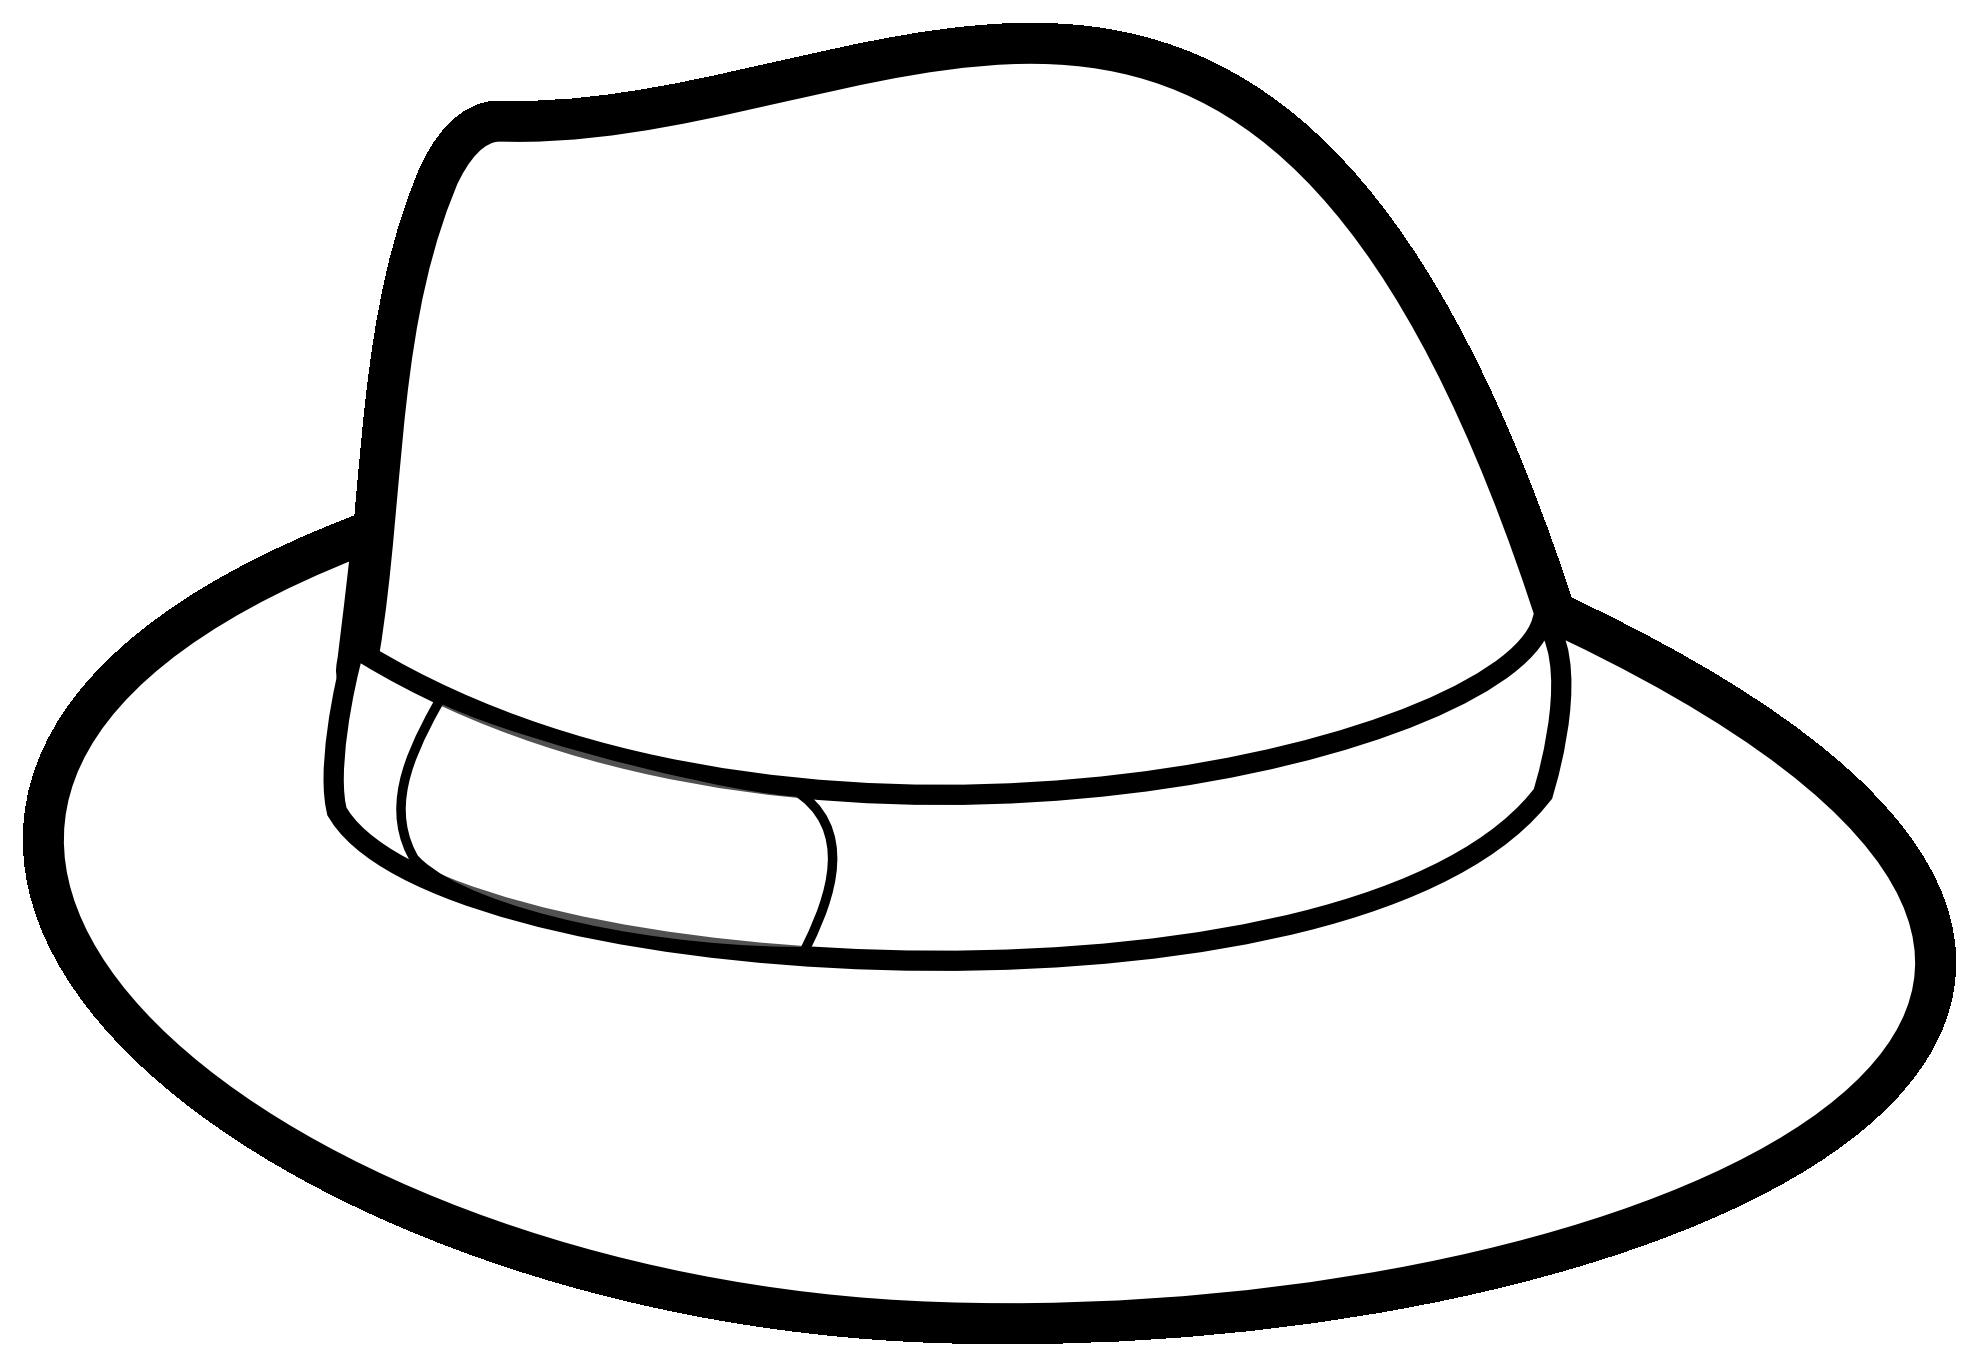 Fedora clipart black and white. Cowboy hat panda free